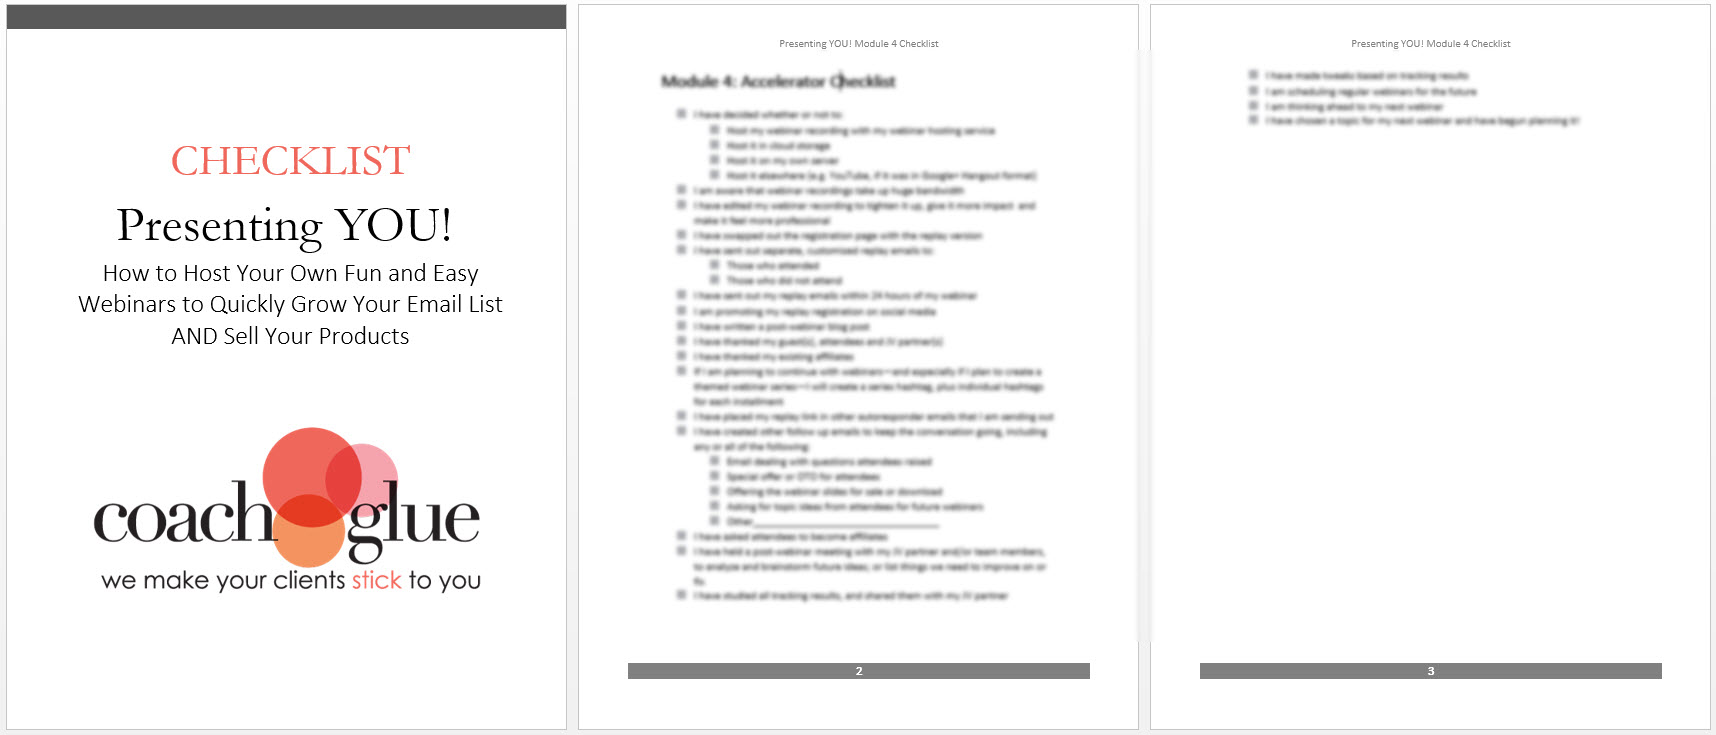 Module 4 checklist screenshot